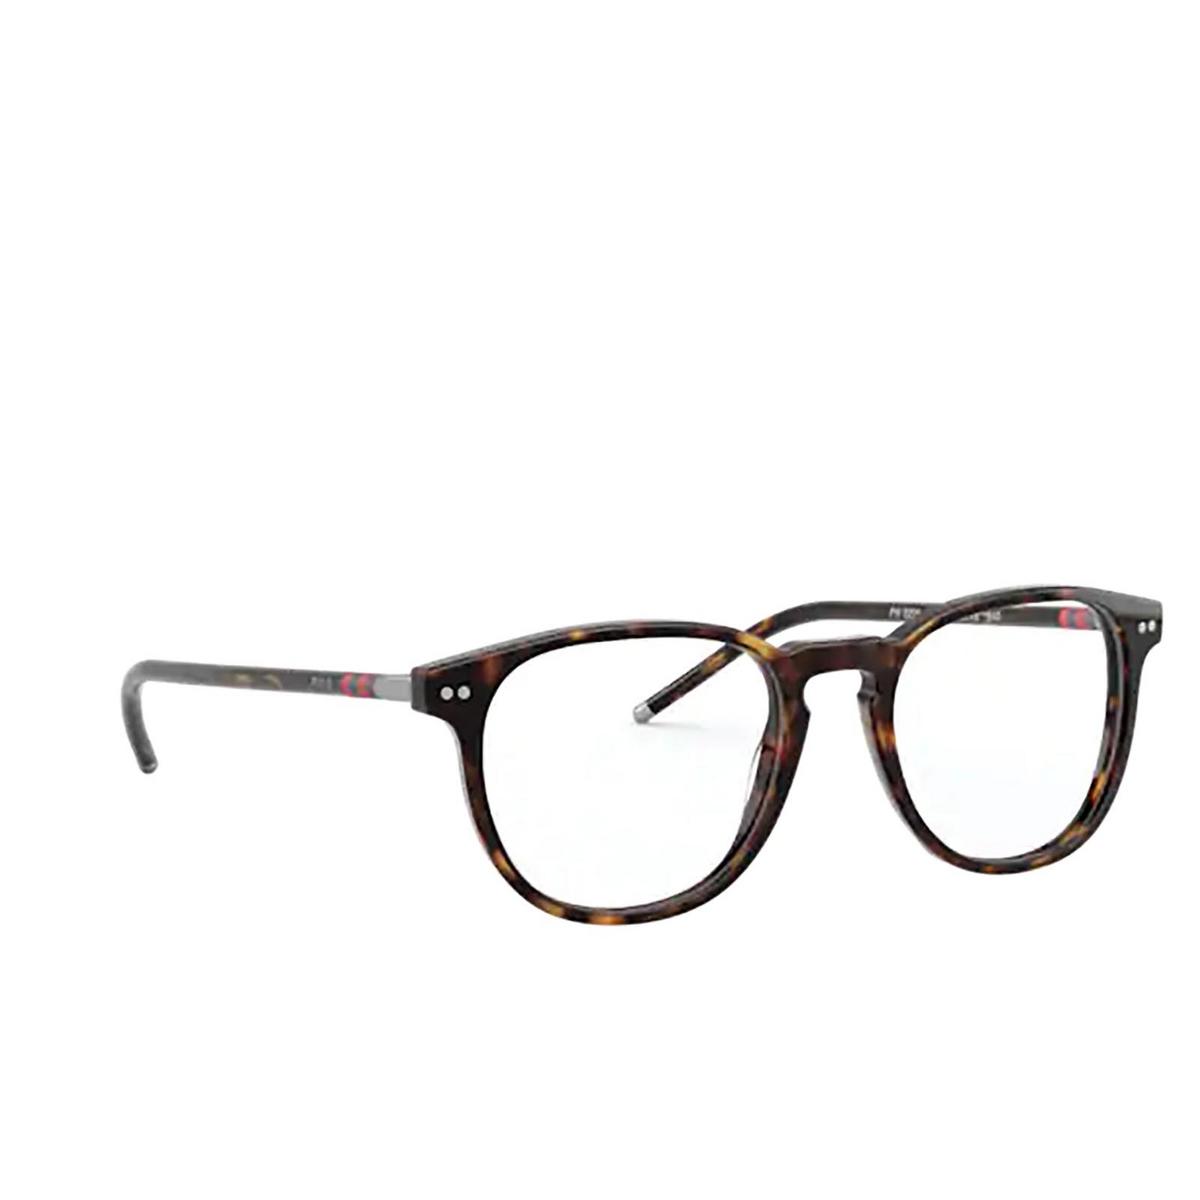 Polo Ralph Lauren® Square Eyeglasses: PH2225 color Shiny Dark Havana 5003 - three-quarters view.